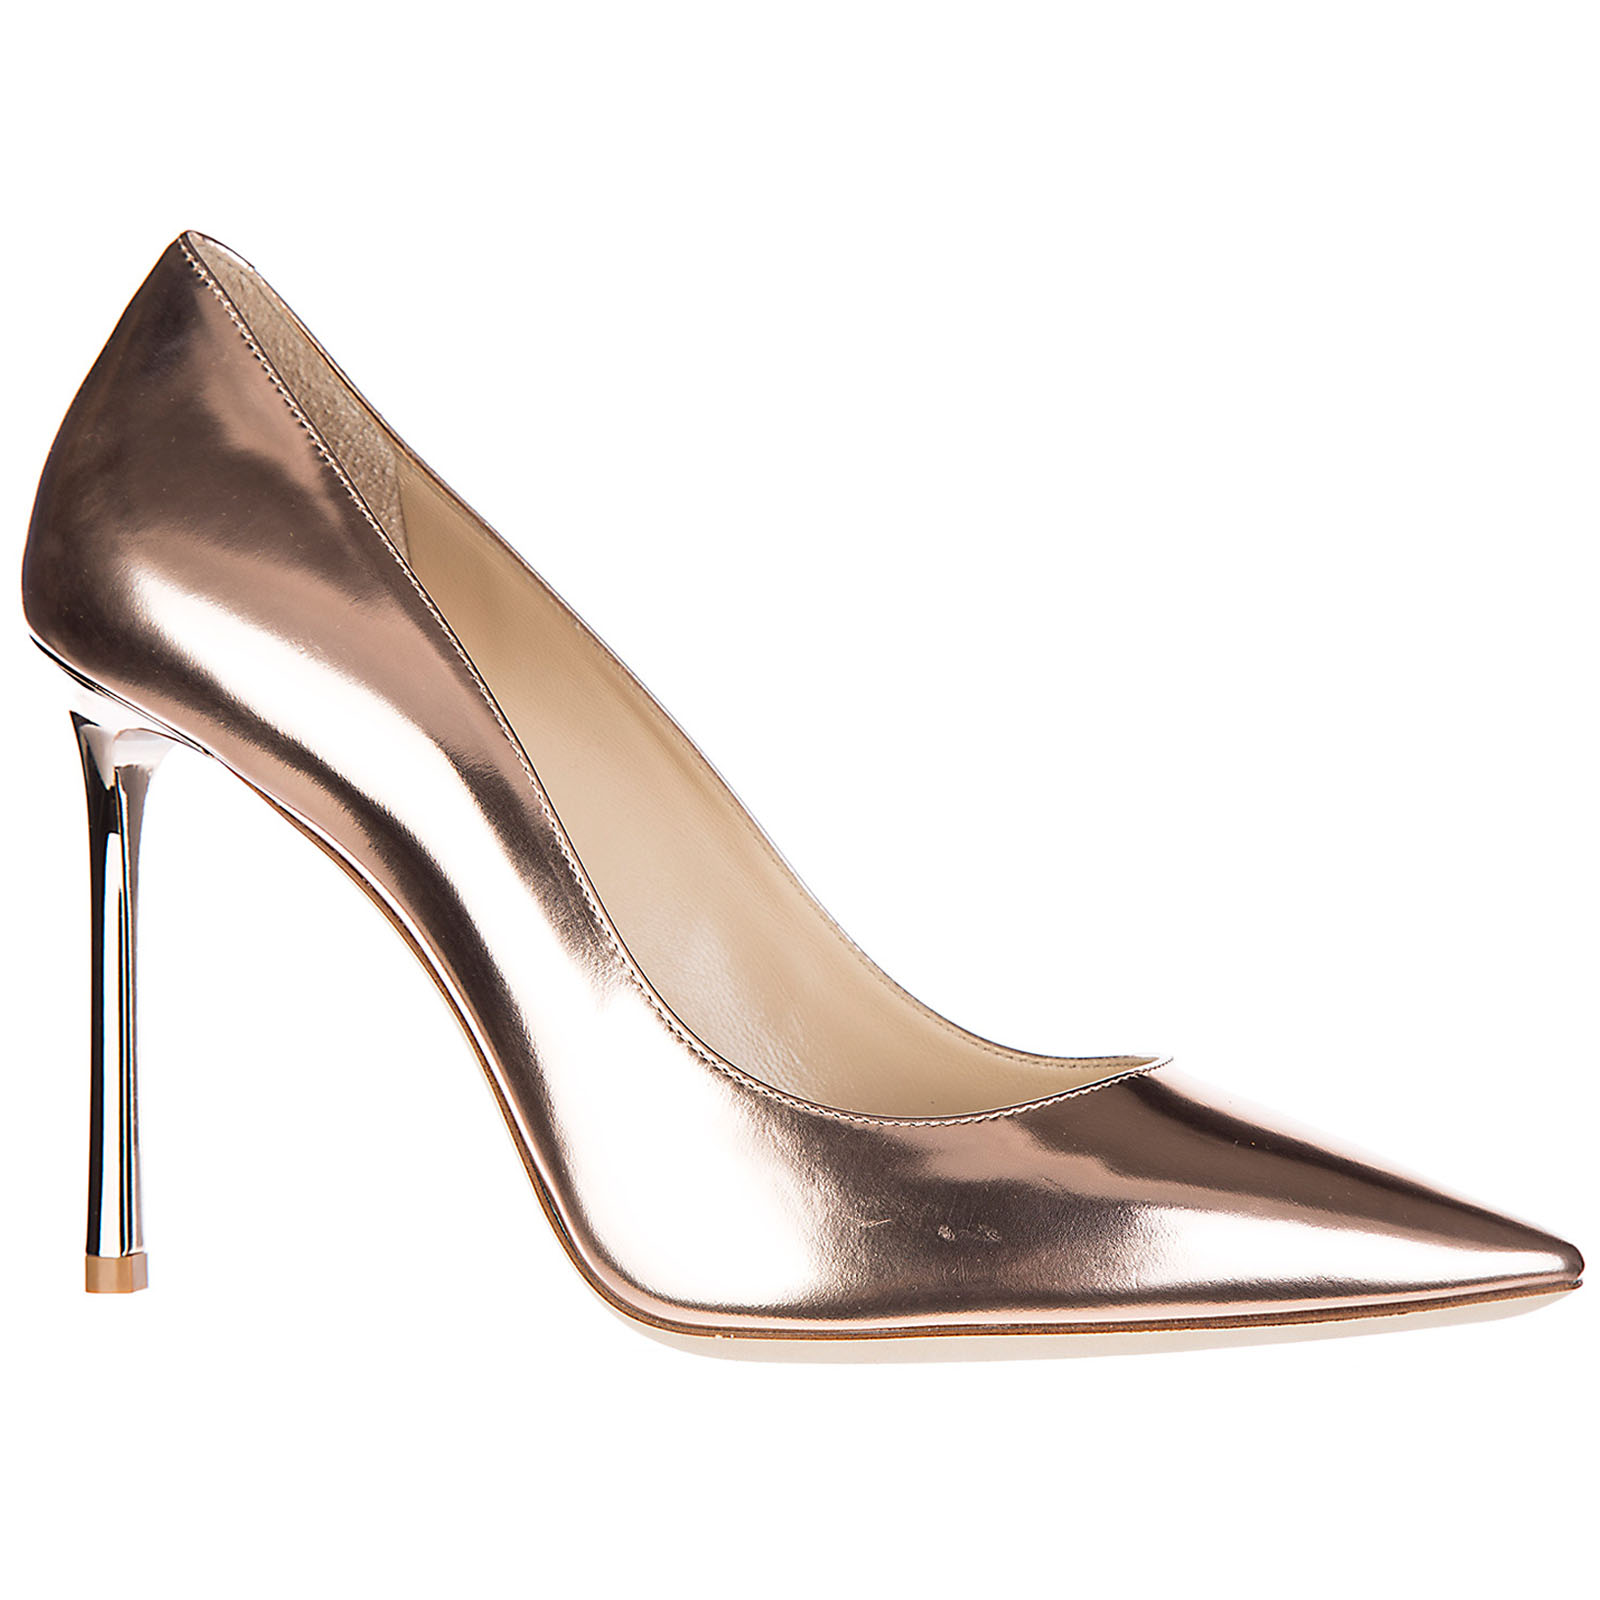 Damenschuhe leder pumps mit absatz high heels romy